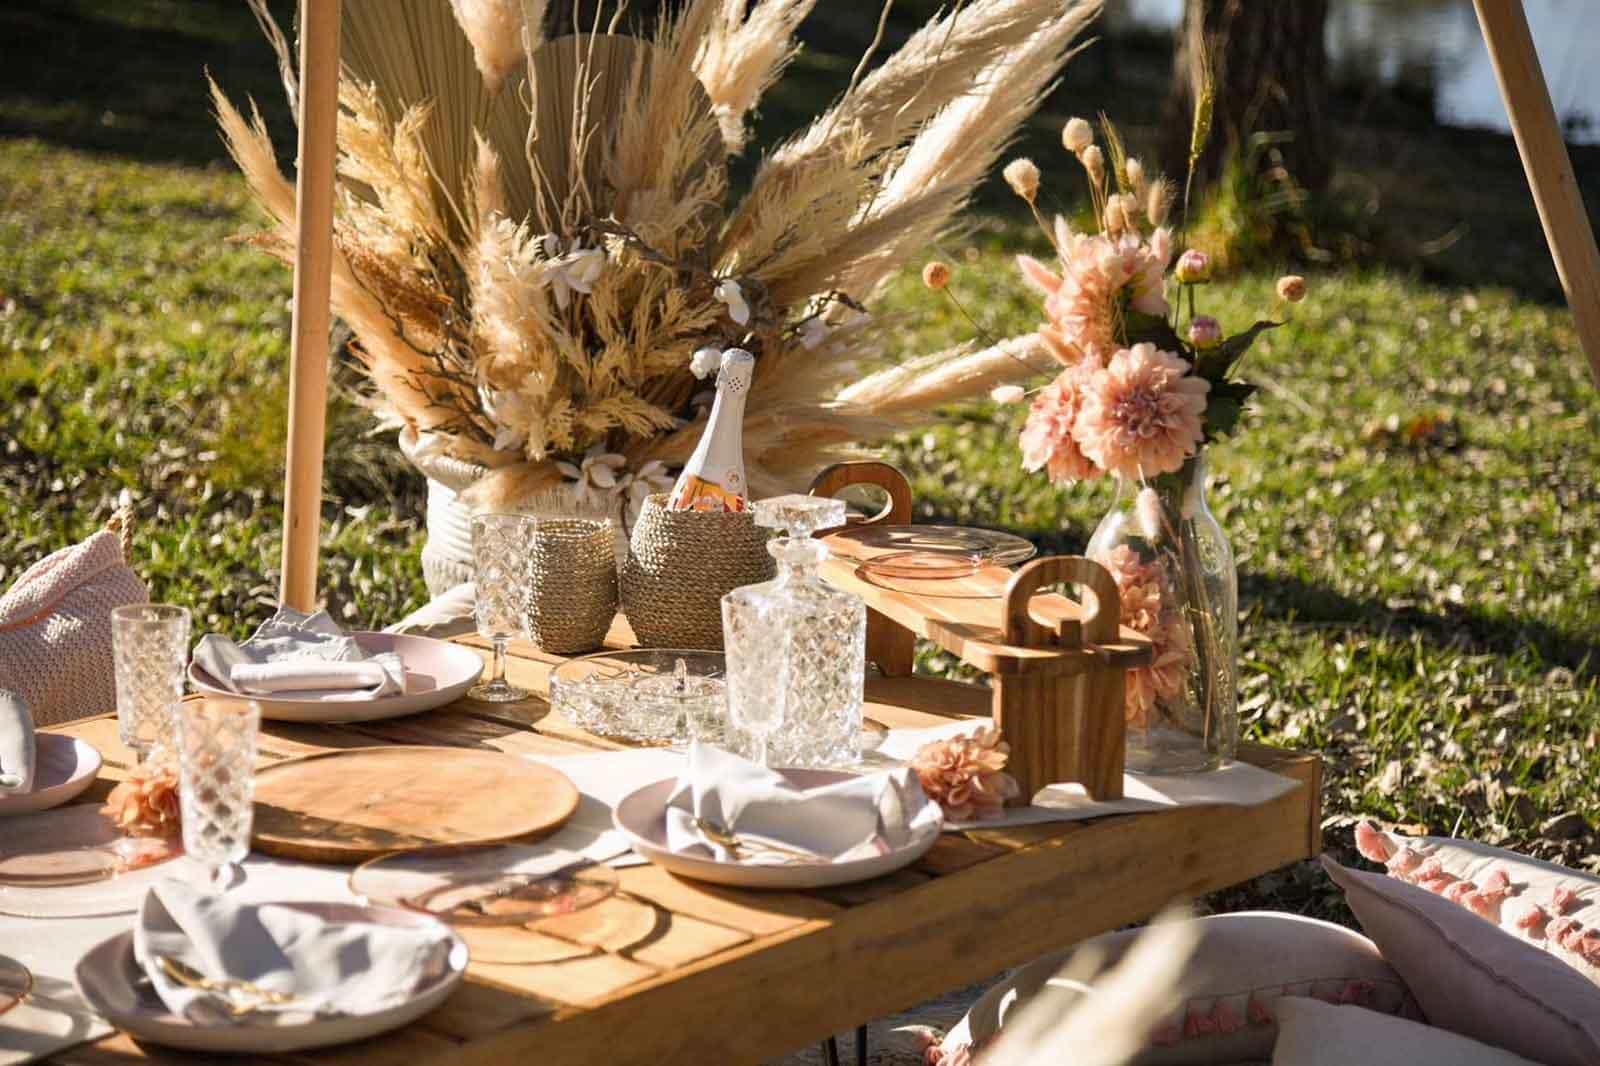 picnic setting-7